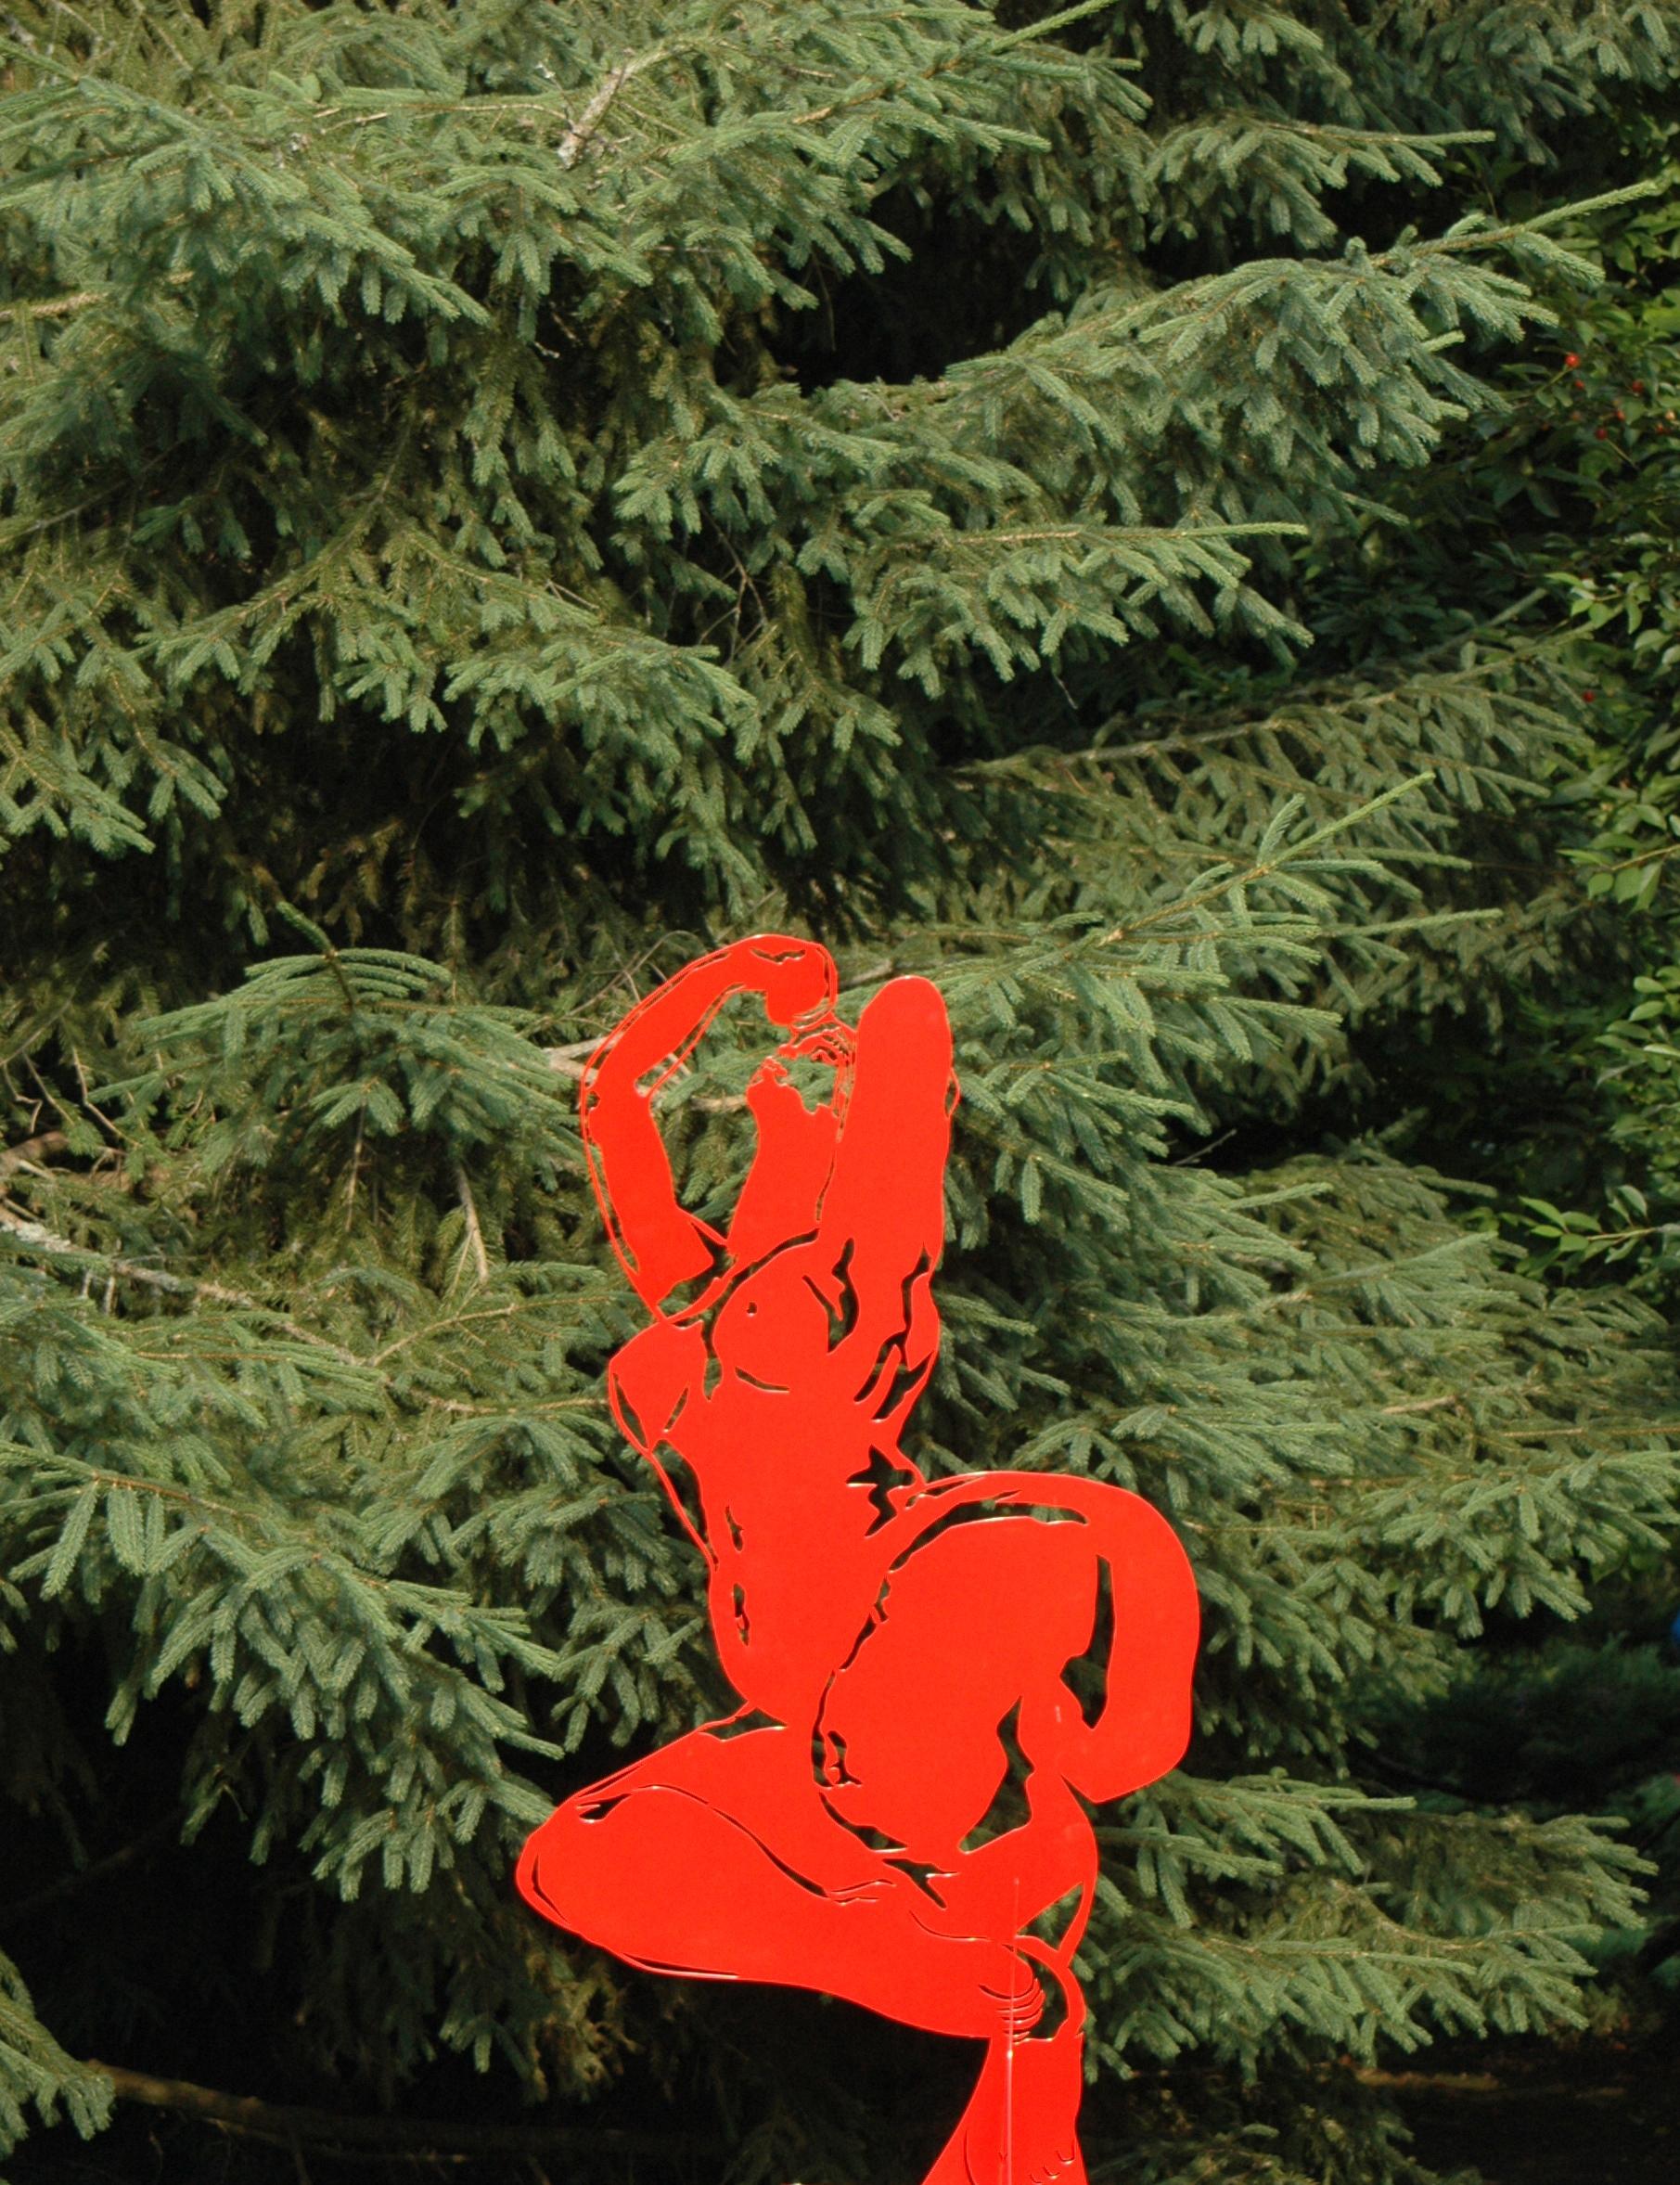 Le jardin des metamorphozes audiard michel for Jardin neurodon 2015